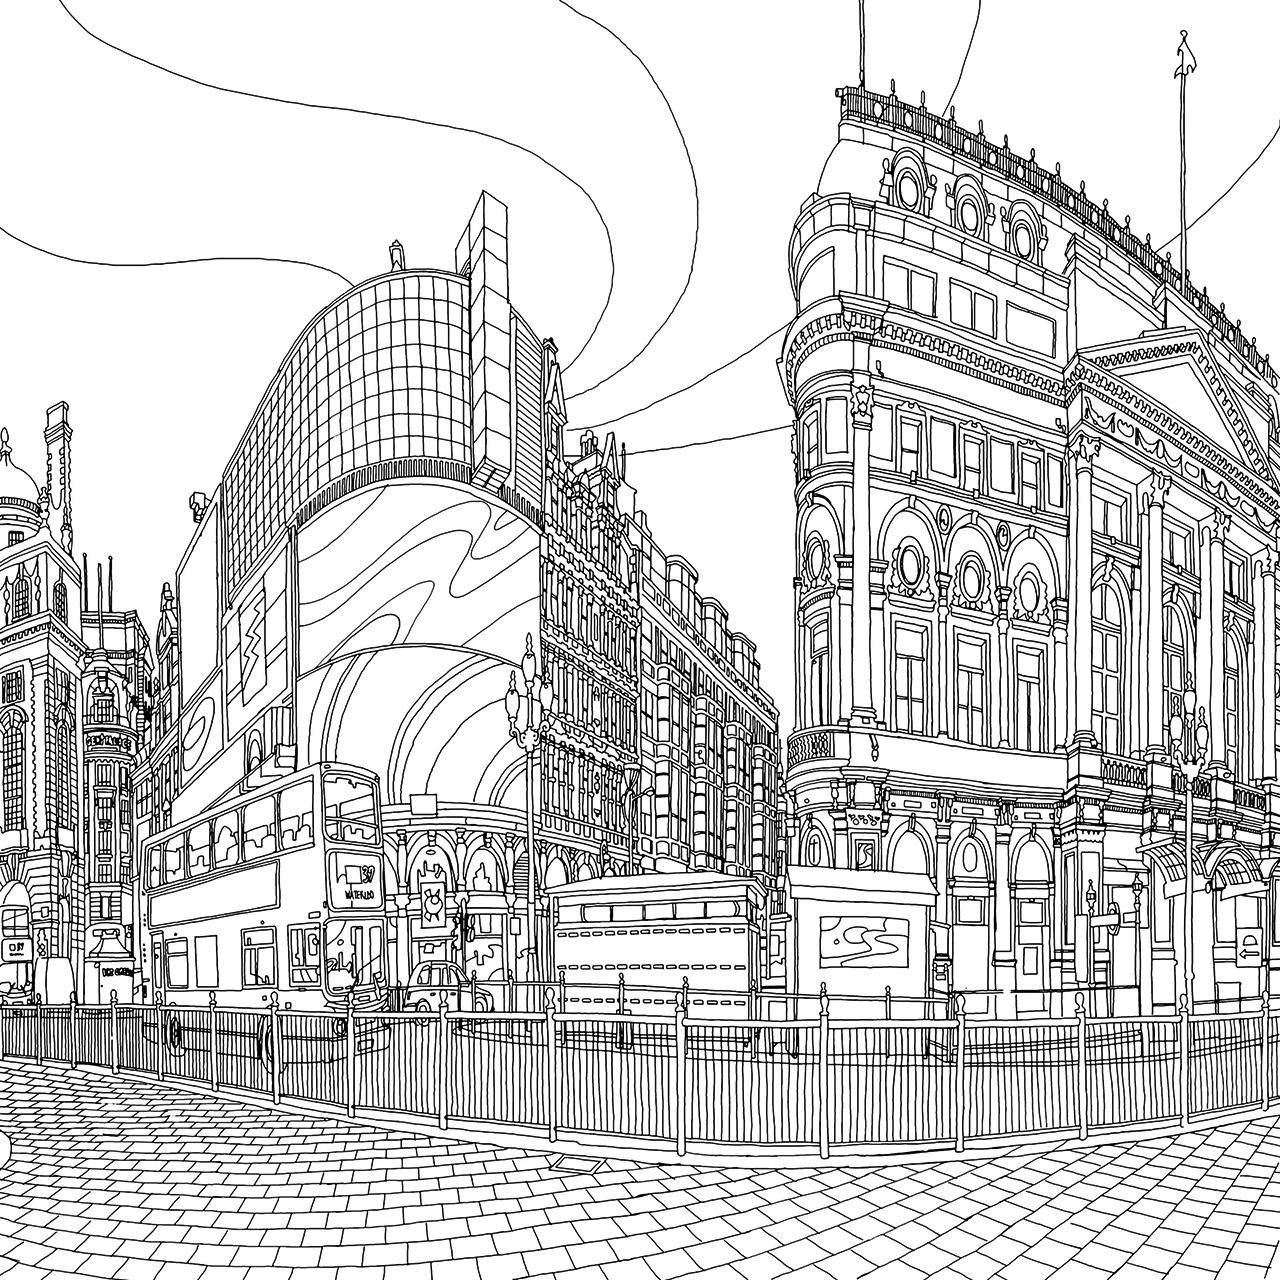 1280x1280 Fantastic Cities By Steve Mcdonald Metalocus